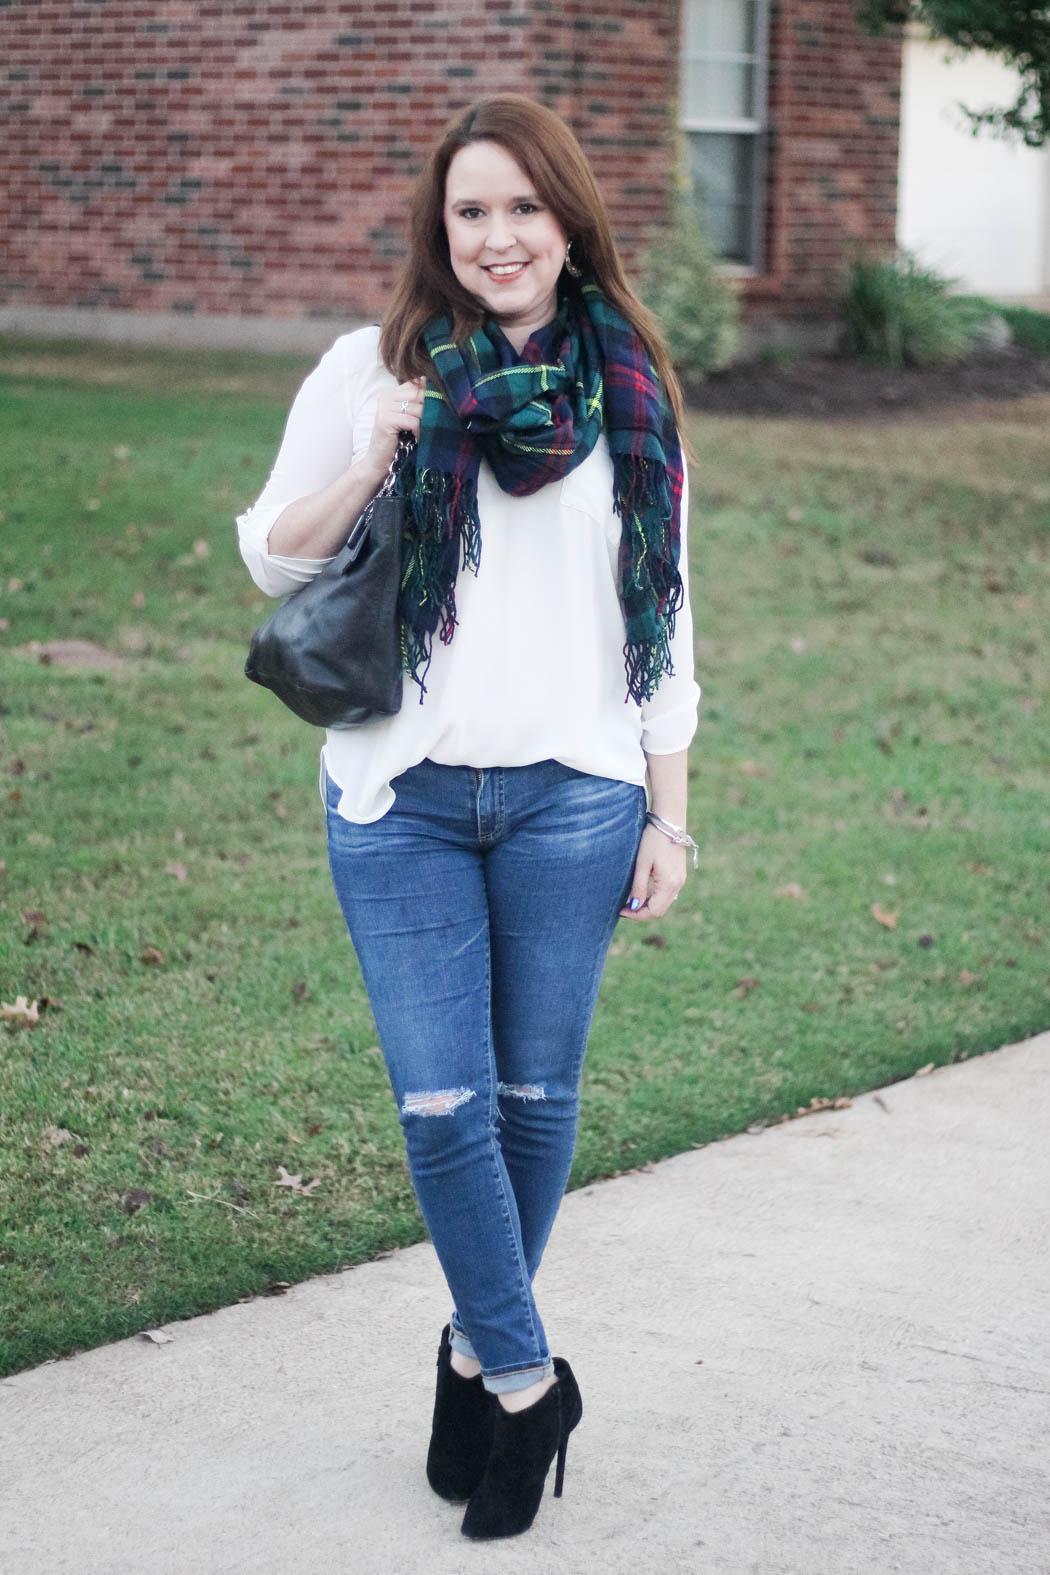 target-scarf-lush-tunic-ag-jeans-coach-bag-charles-david-booties-6